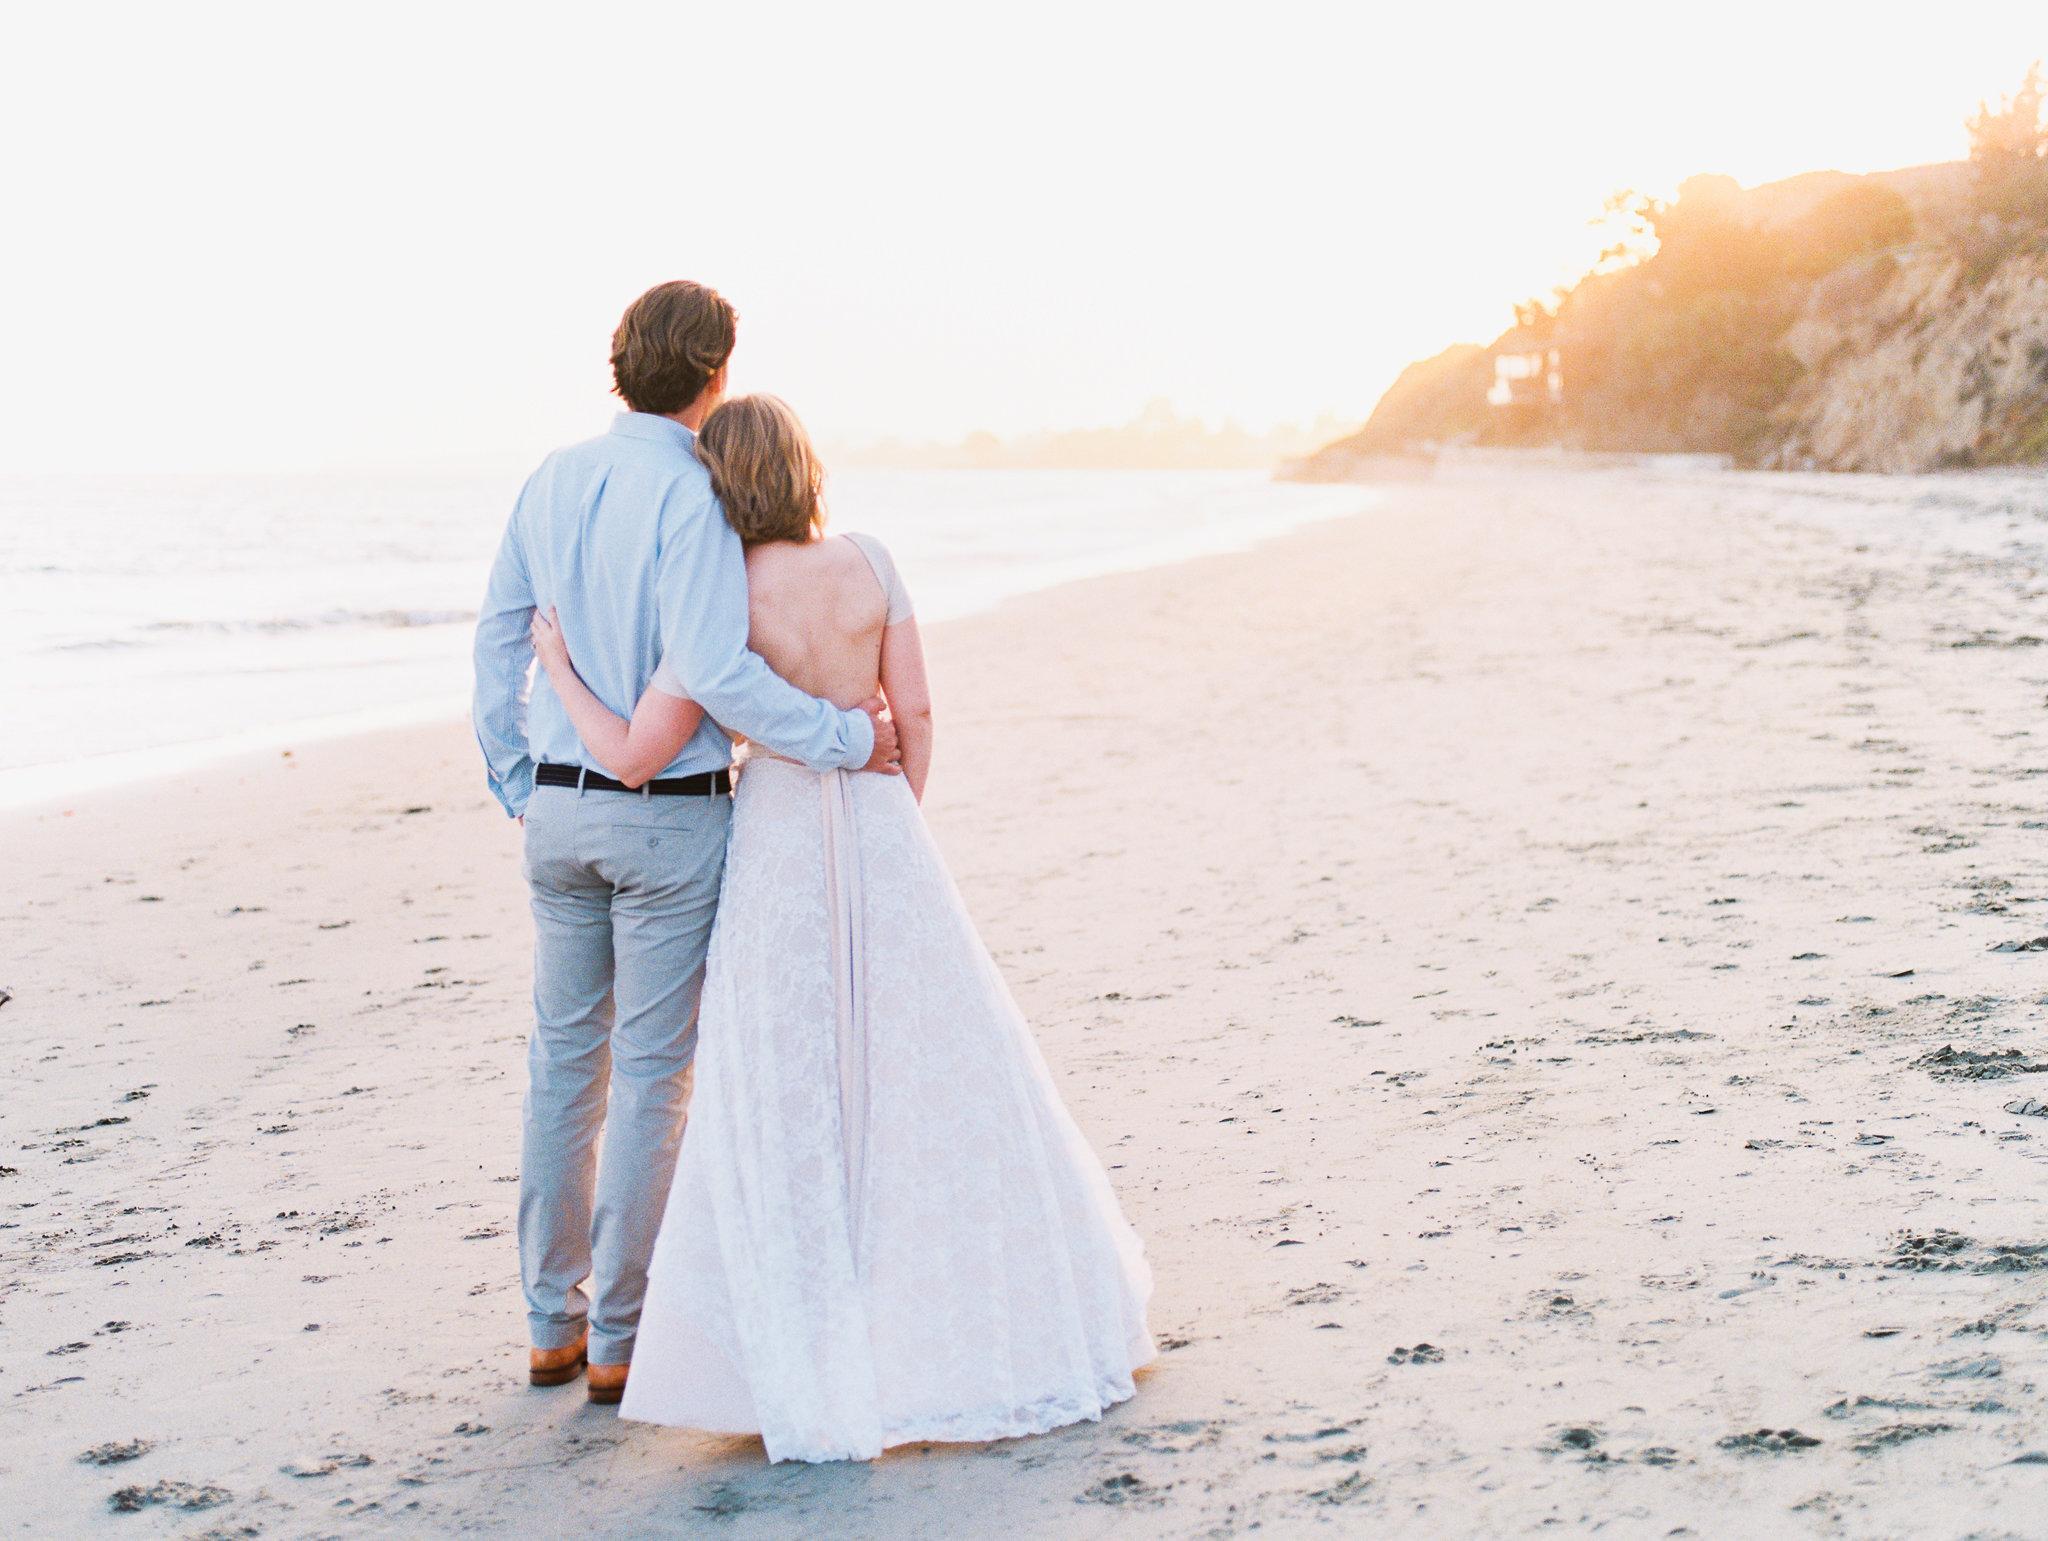 santa-barbara-elopement-wedding-elope-planner-event-design-coordinator-day-of-intimate-small-beach-ocean-view-front-lantern-blush-driftwood-summerland (15).jpg